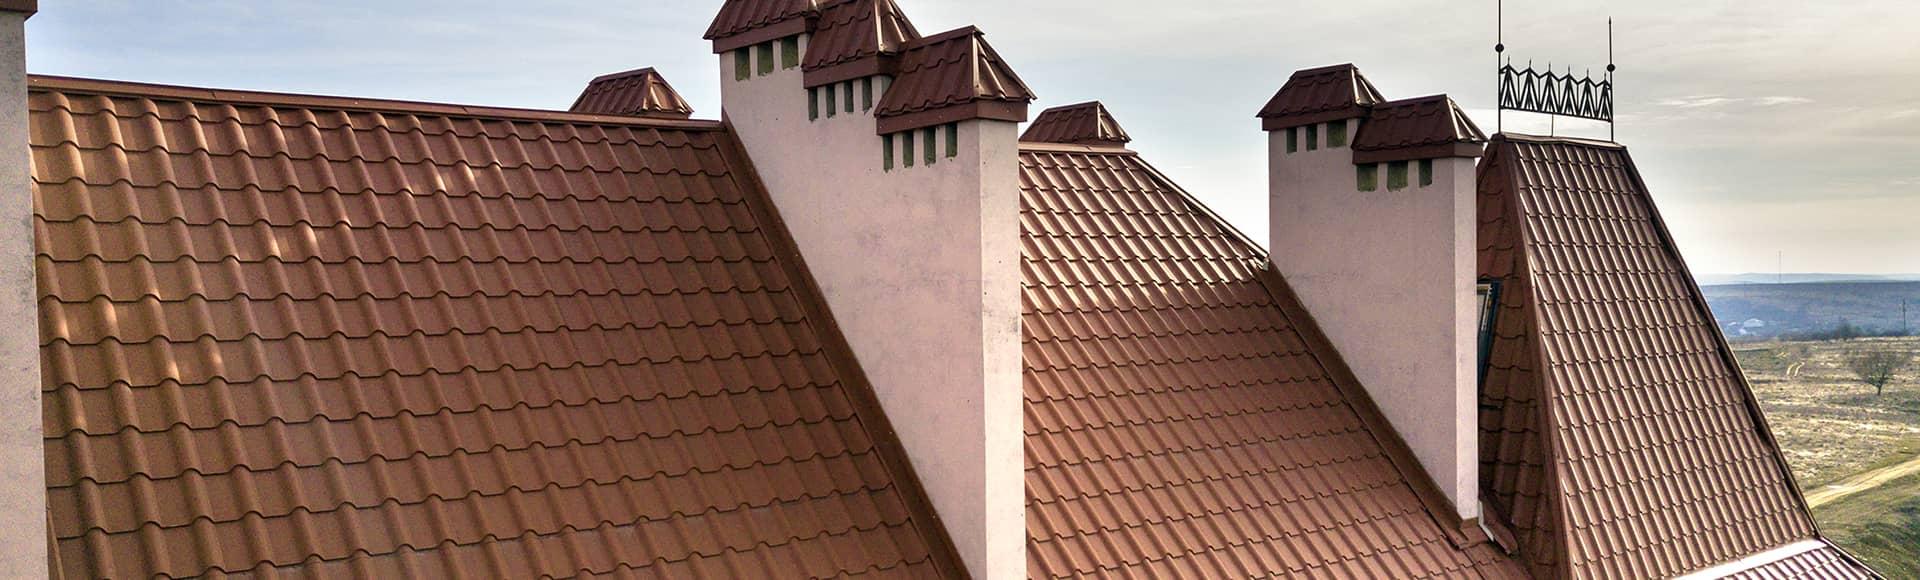 %Roofing Contractor